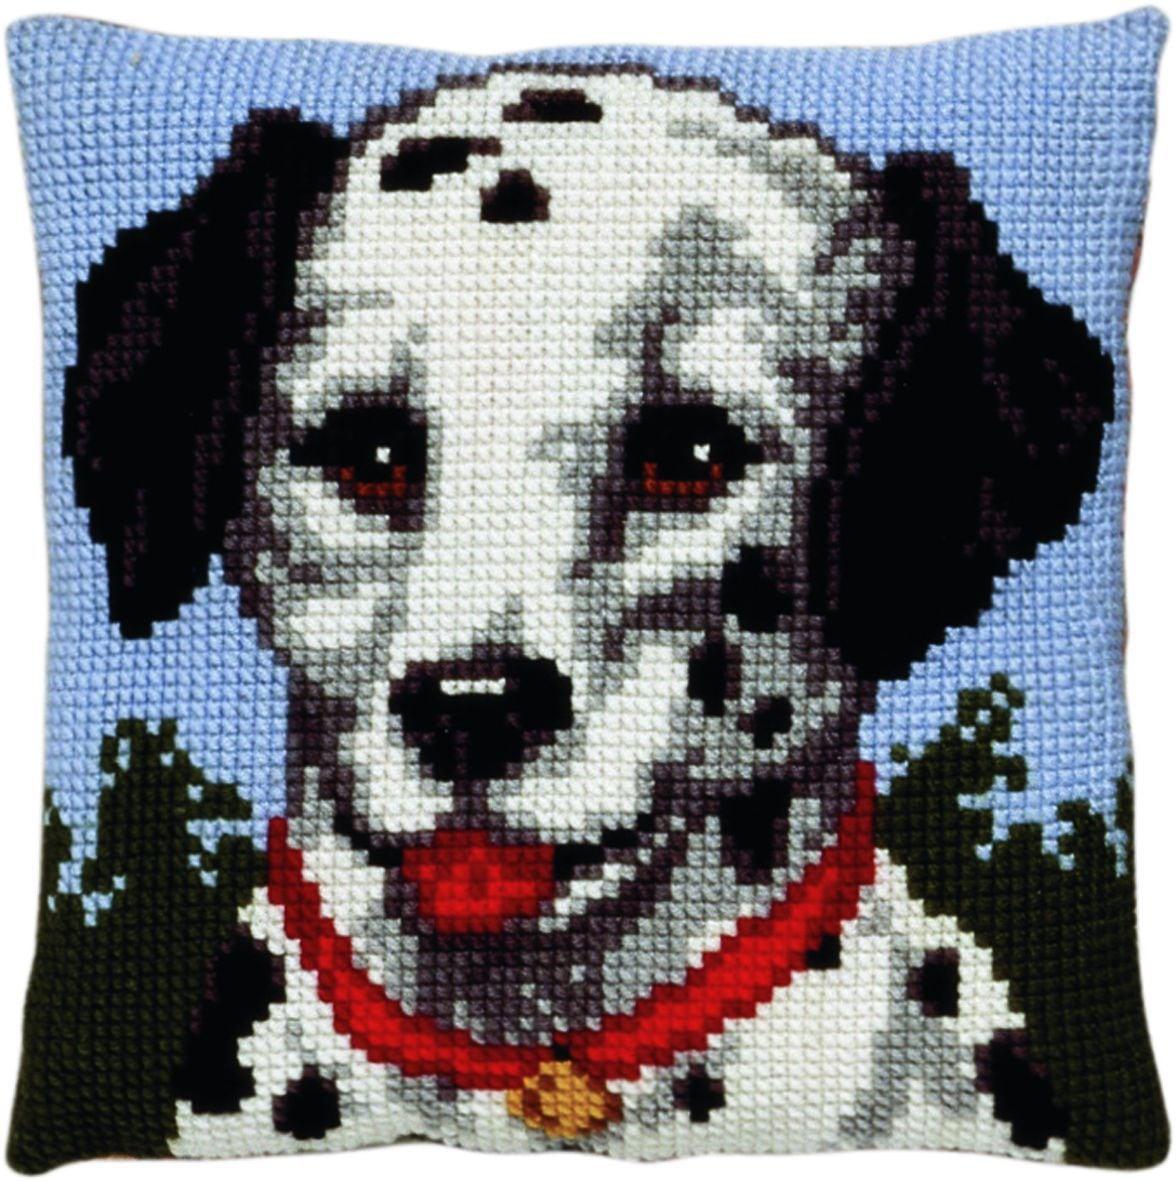 kussen dalmatir hond borduurpakket